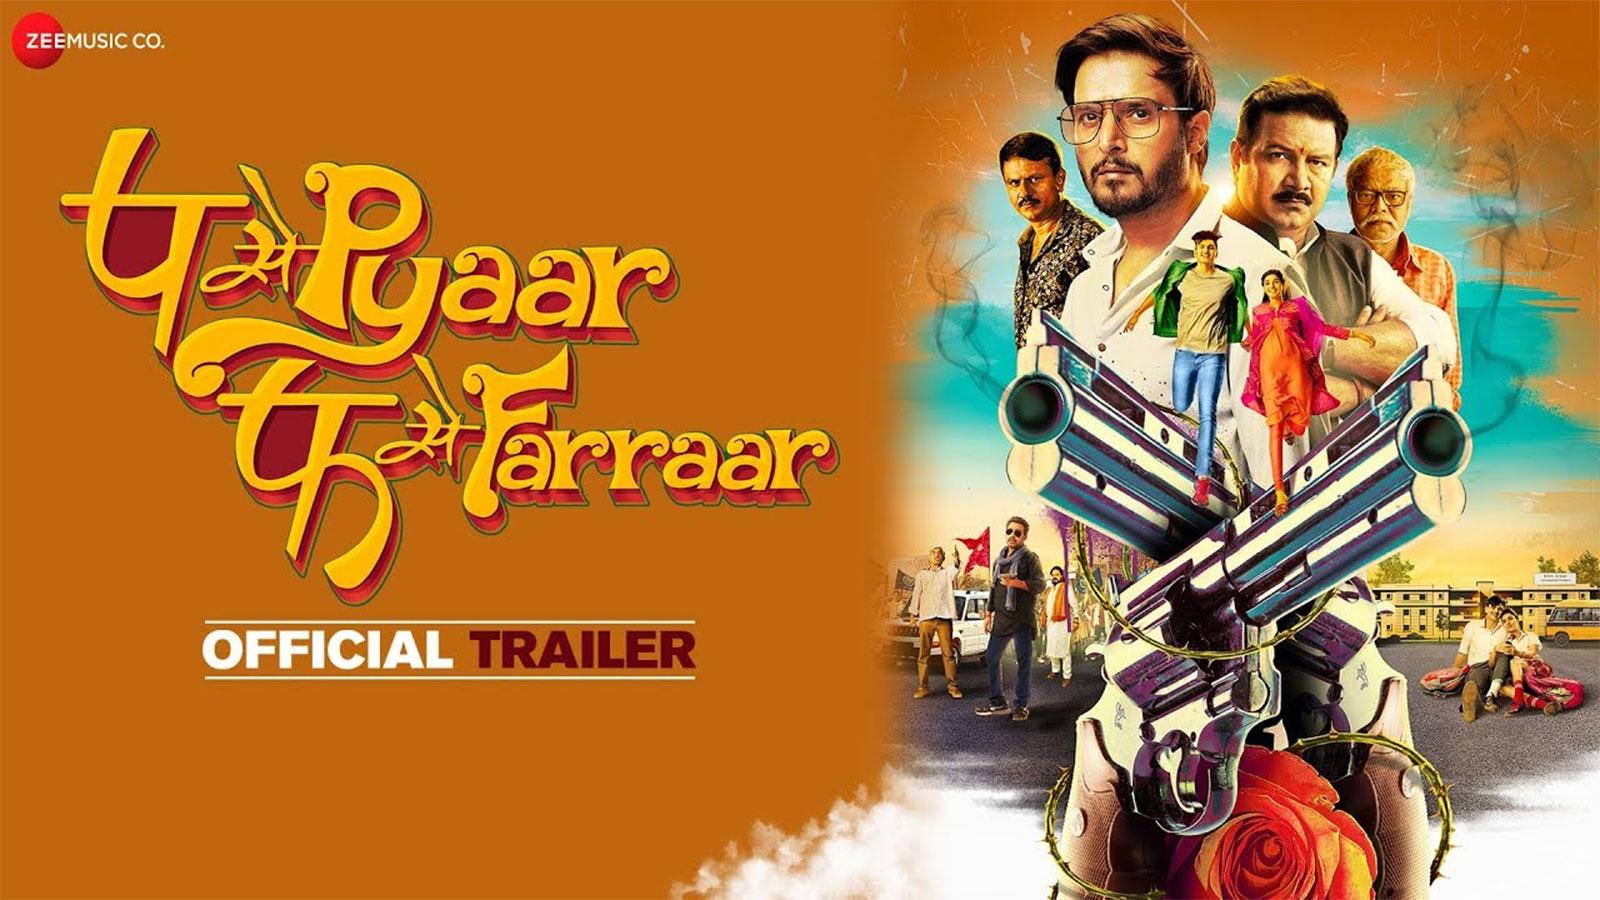 P Se Pyaar F Se Faraar - Official Trailer